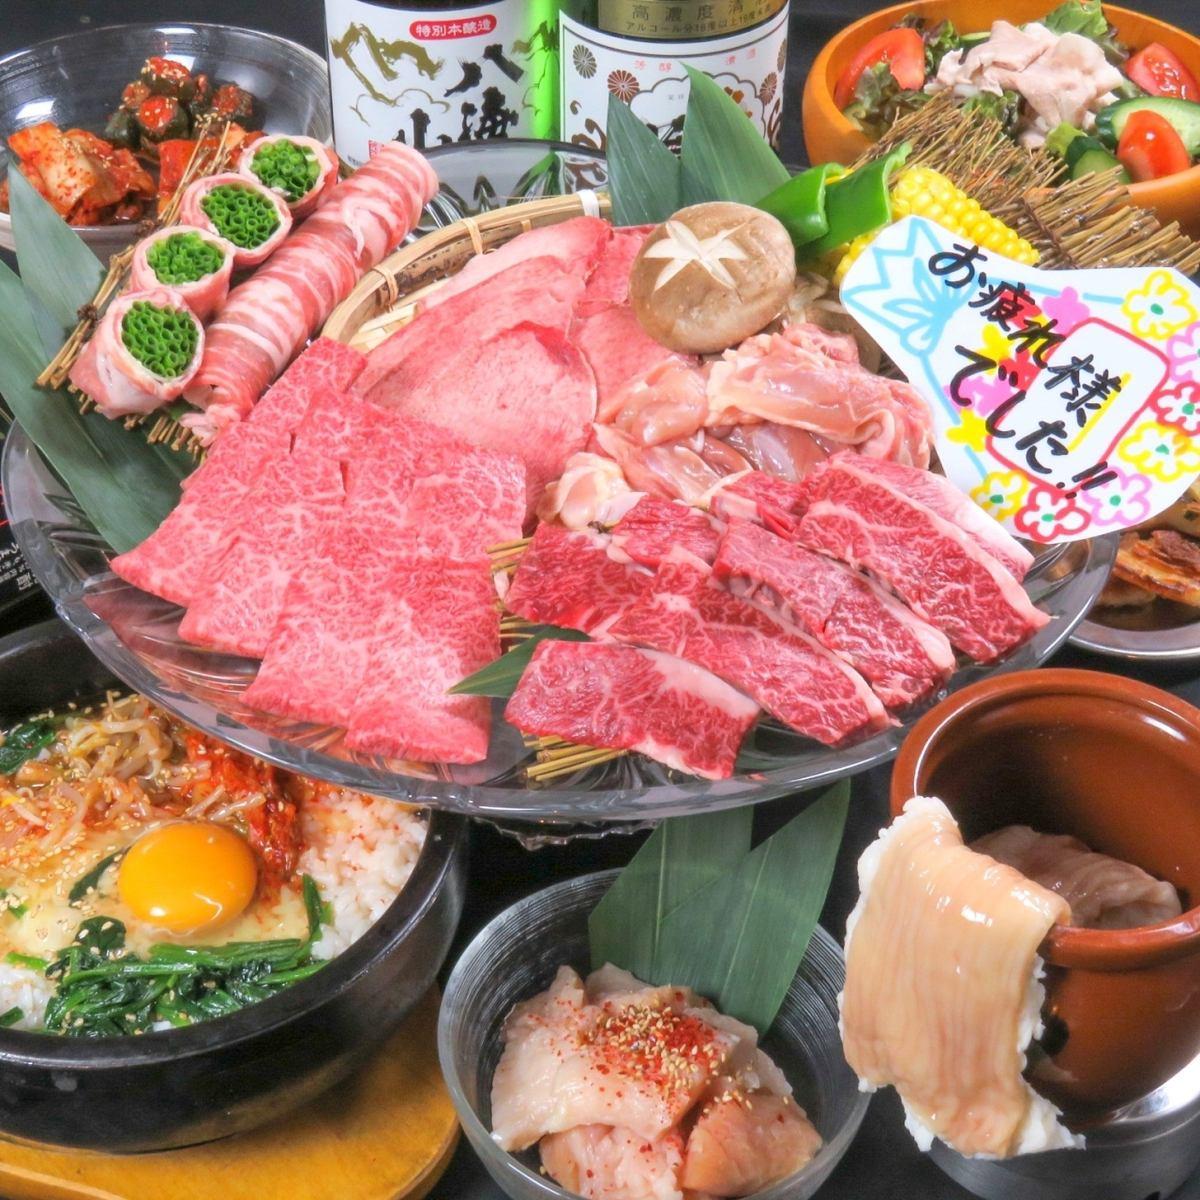 【Forgotten annual meeting, various banquet courses】 Calvi, loins, etc. All 11 items 2500 yen ~